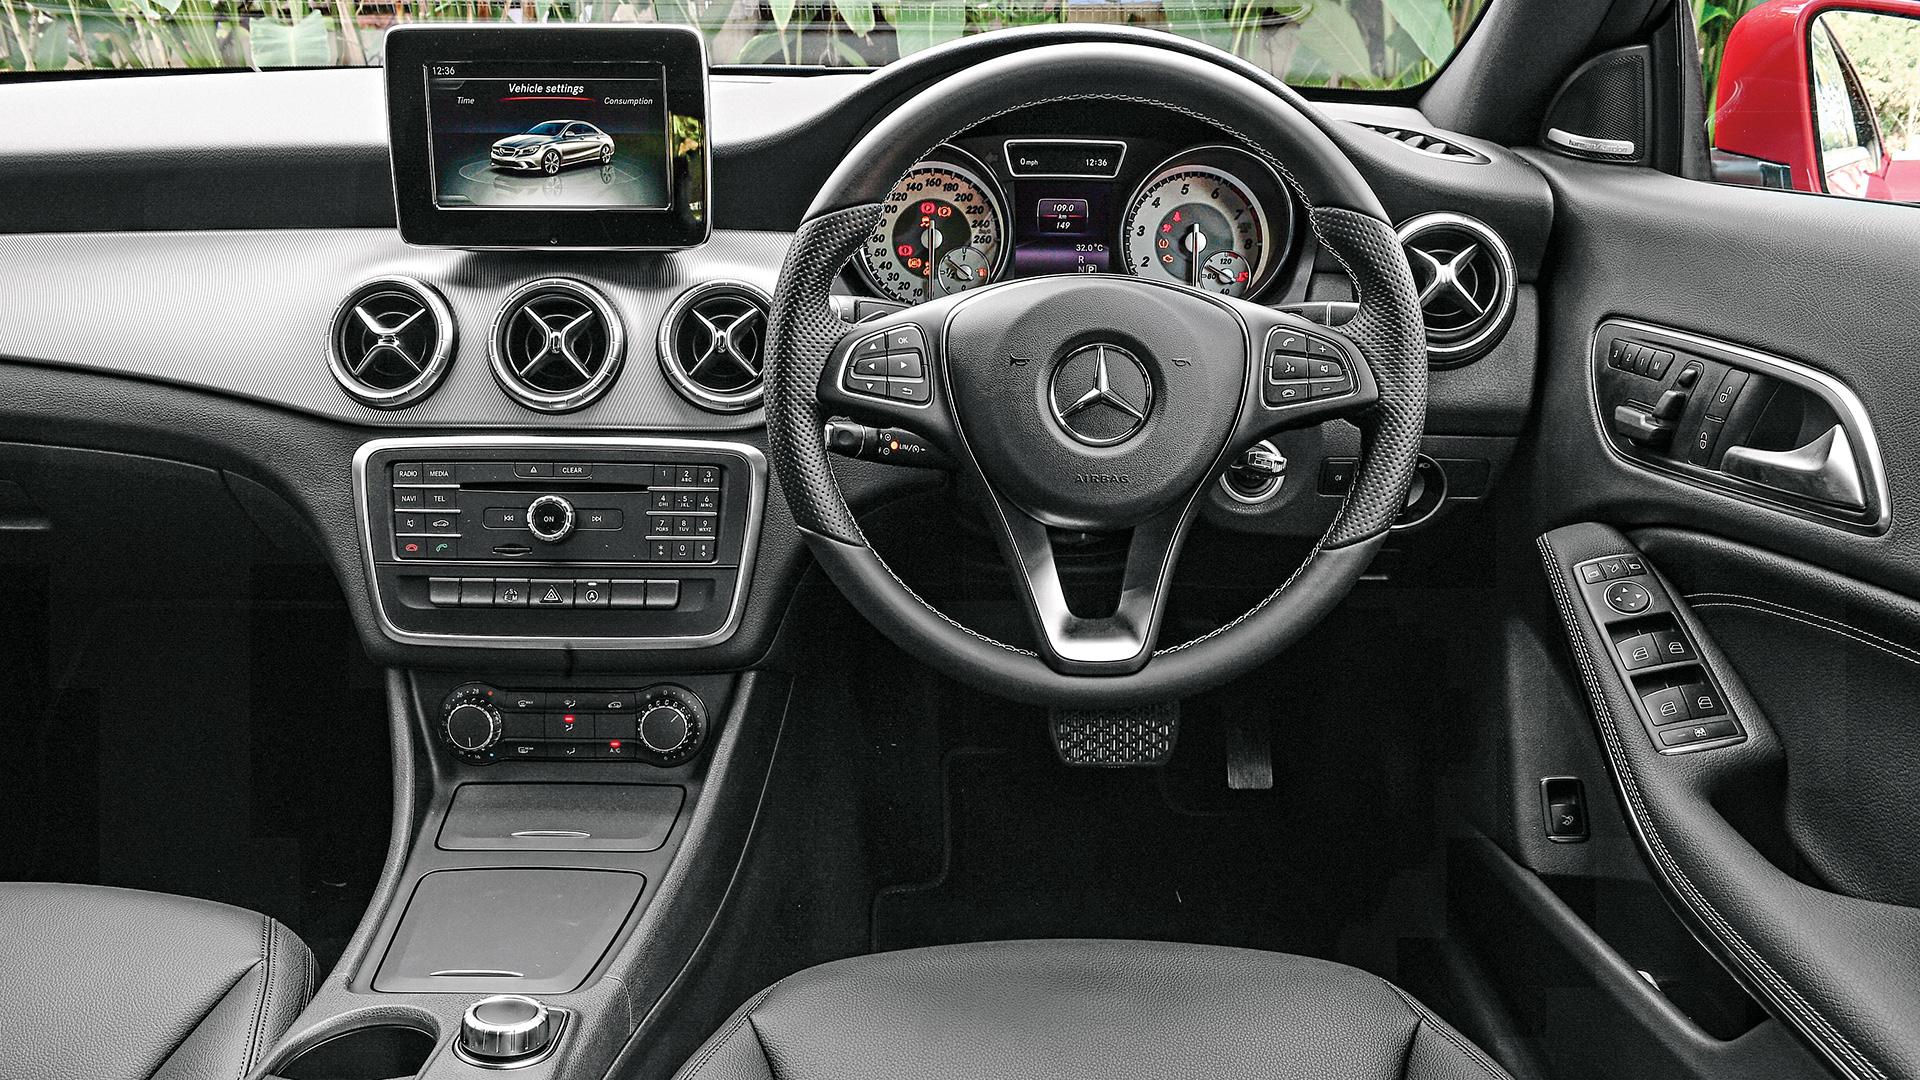 Mercedesbenz-cla-2015 Exterior